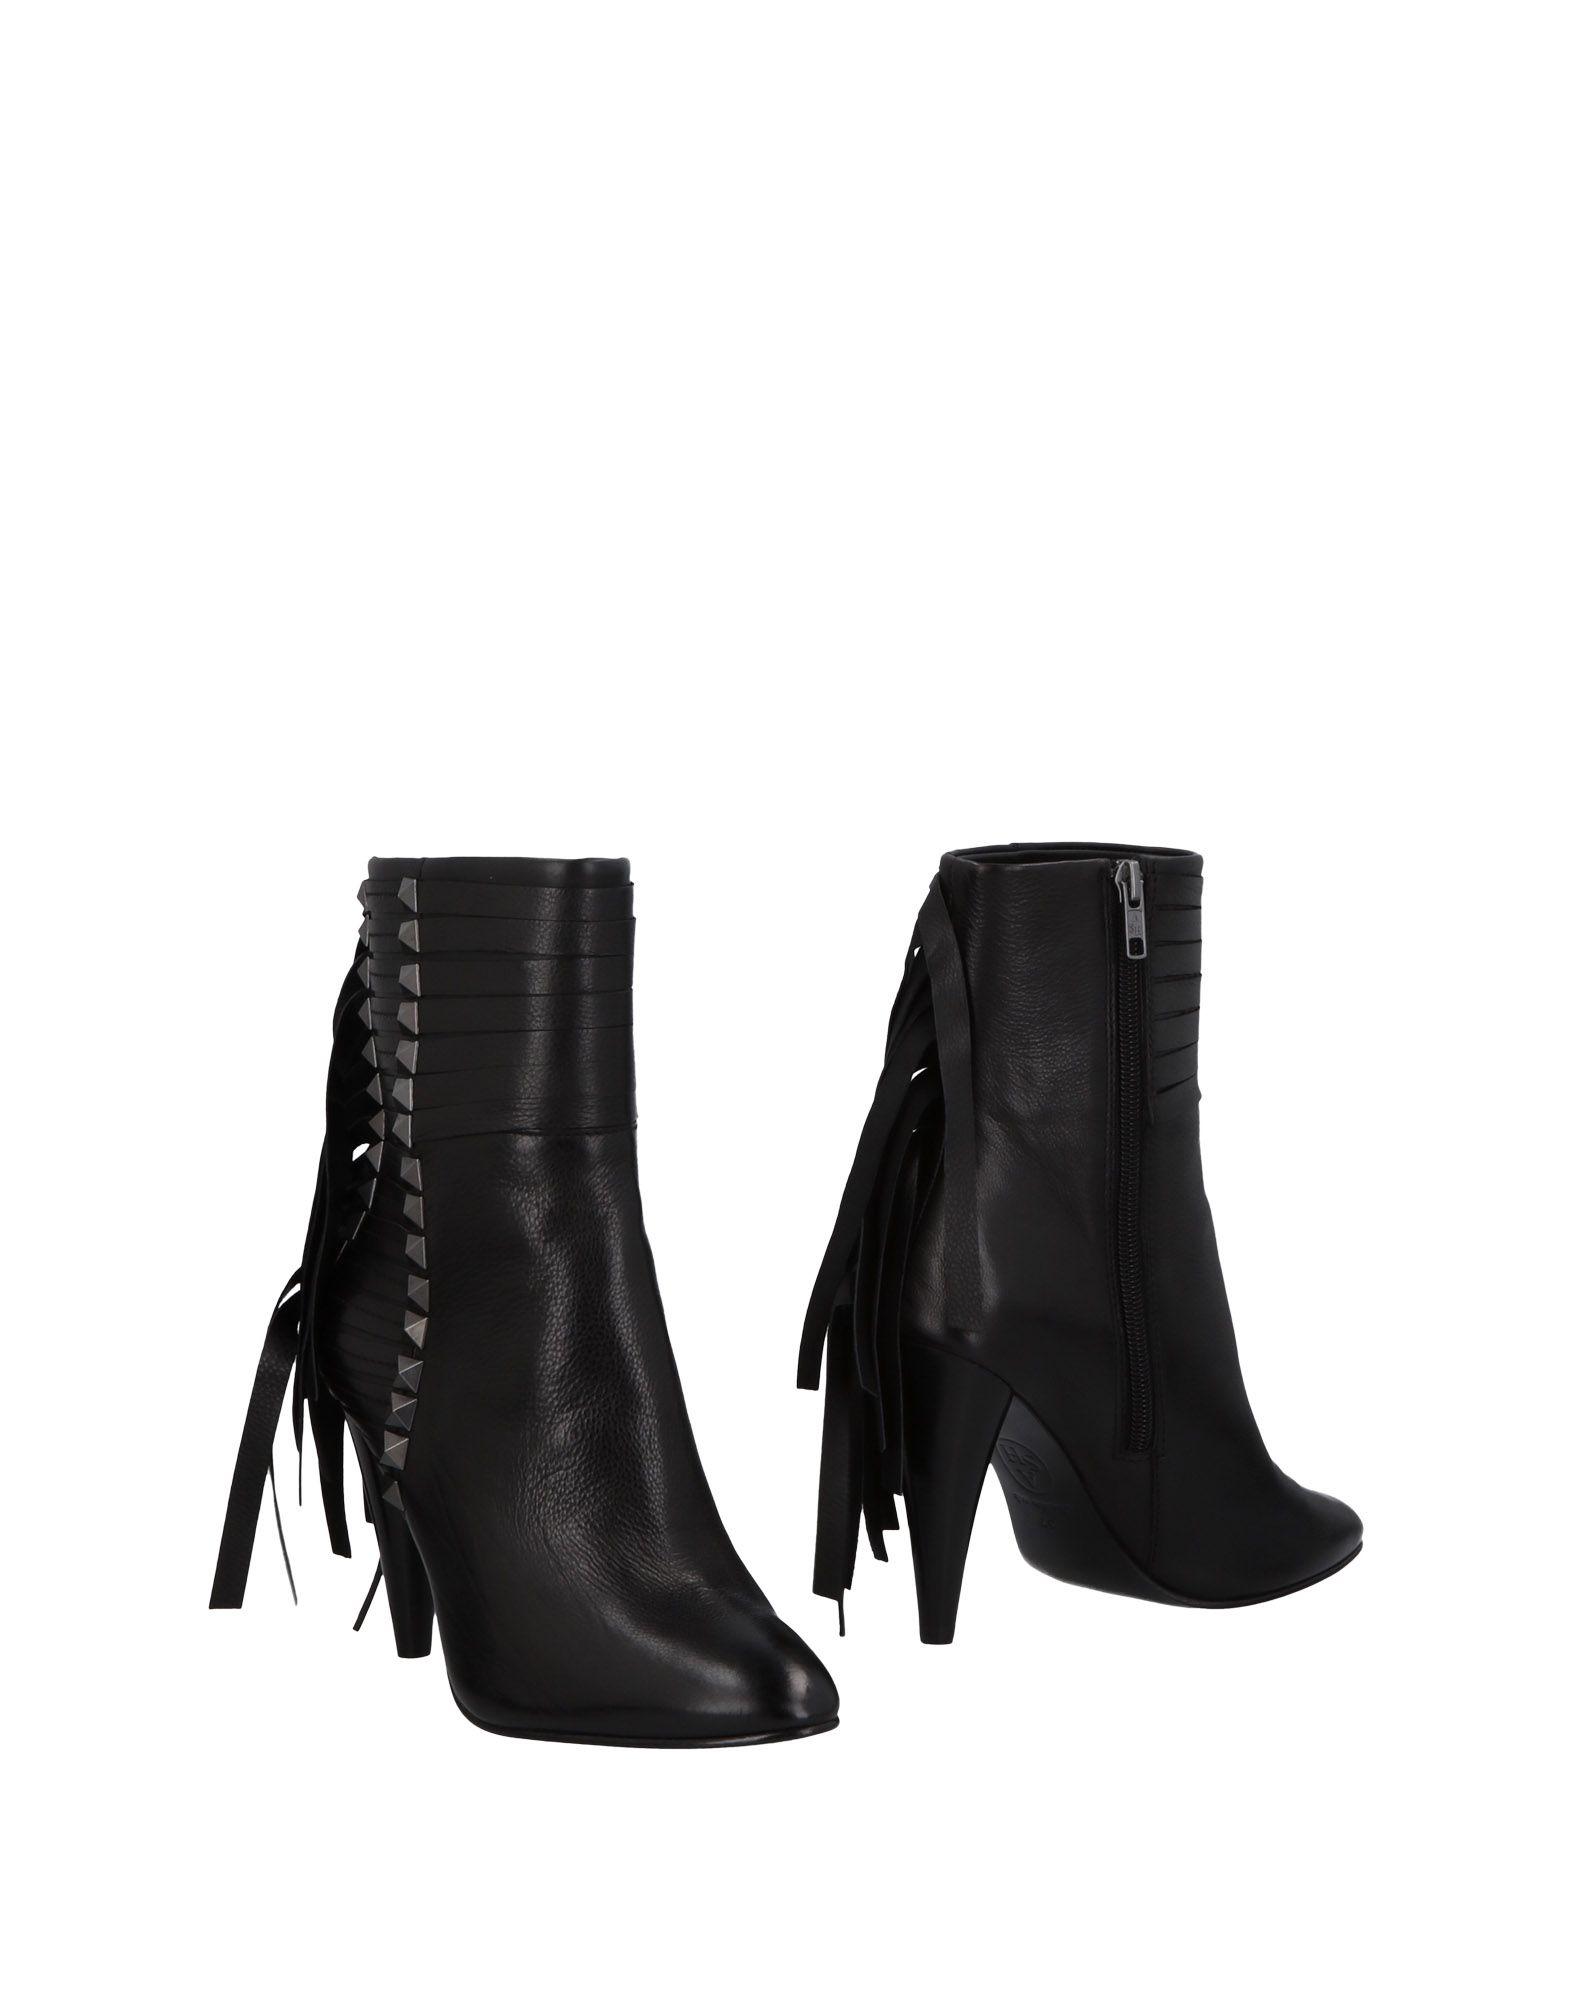 Ash Stiefelette Damen  11468333CQGut Schuhe aussehende strapazierfähige Schuhe 11468333CQGut 155bc5